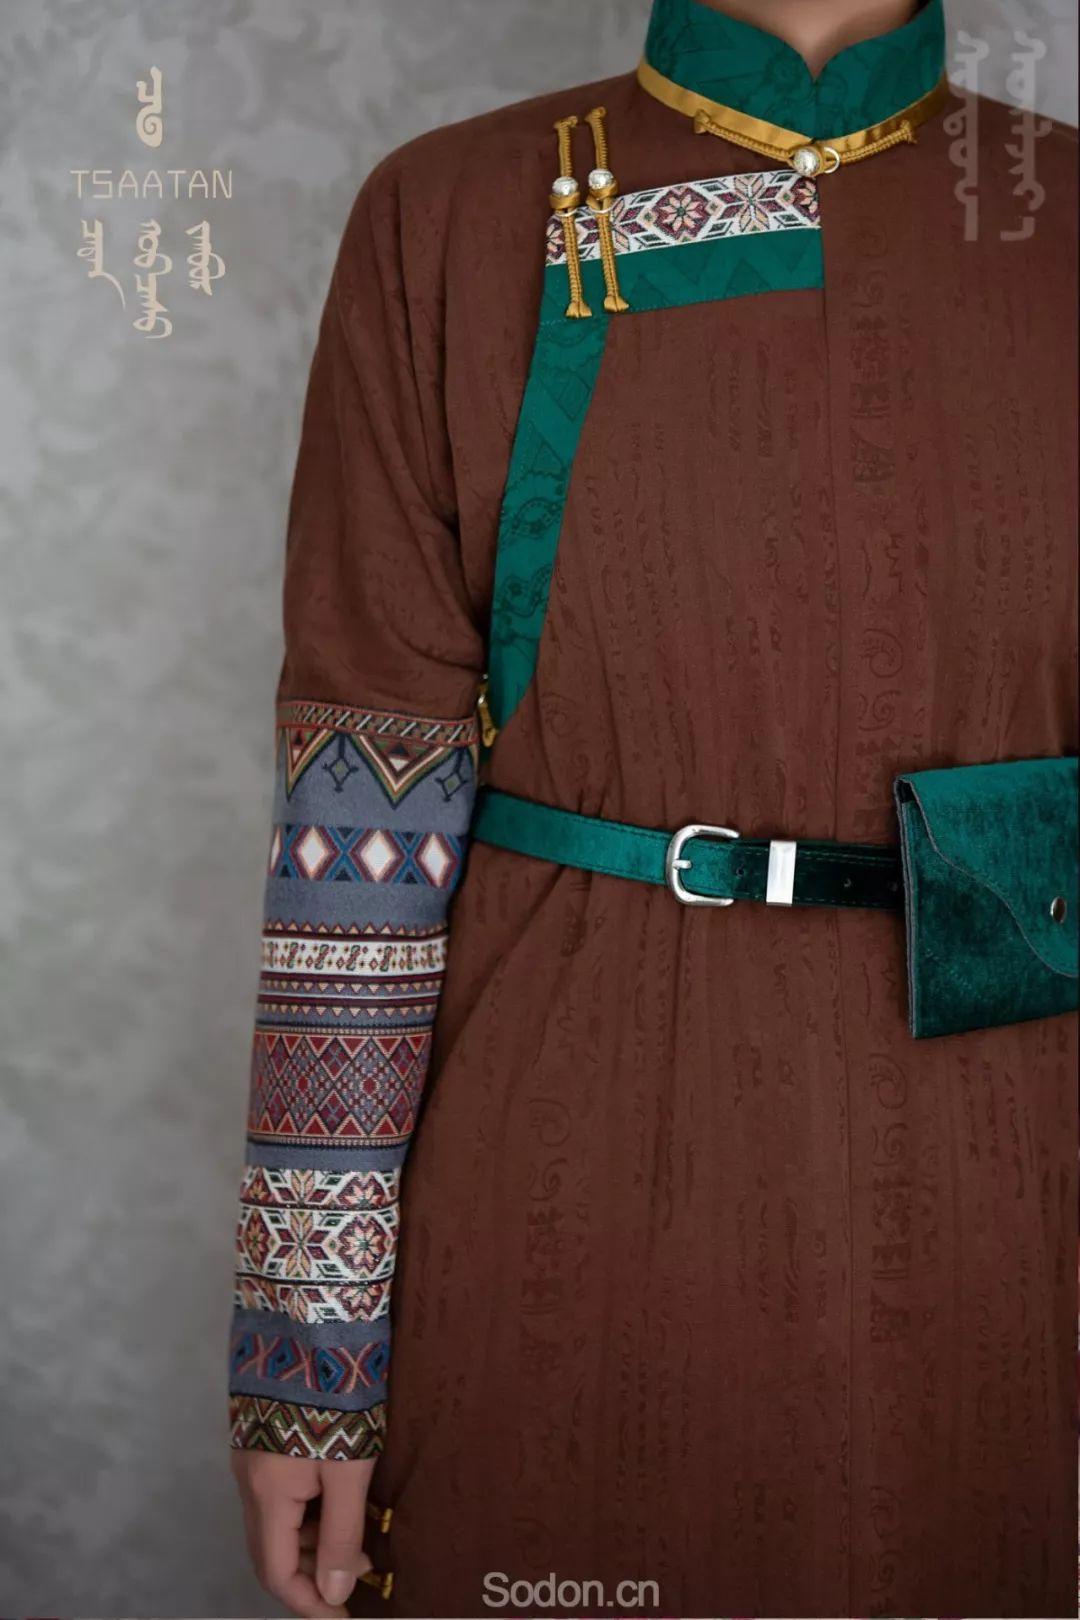 TSAATAN蒙古时装秋冬系列,来自驯鹿人的独特魅力! 第55张